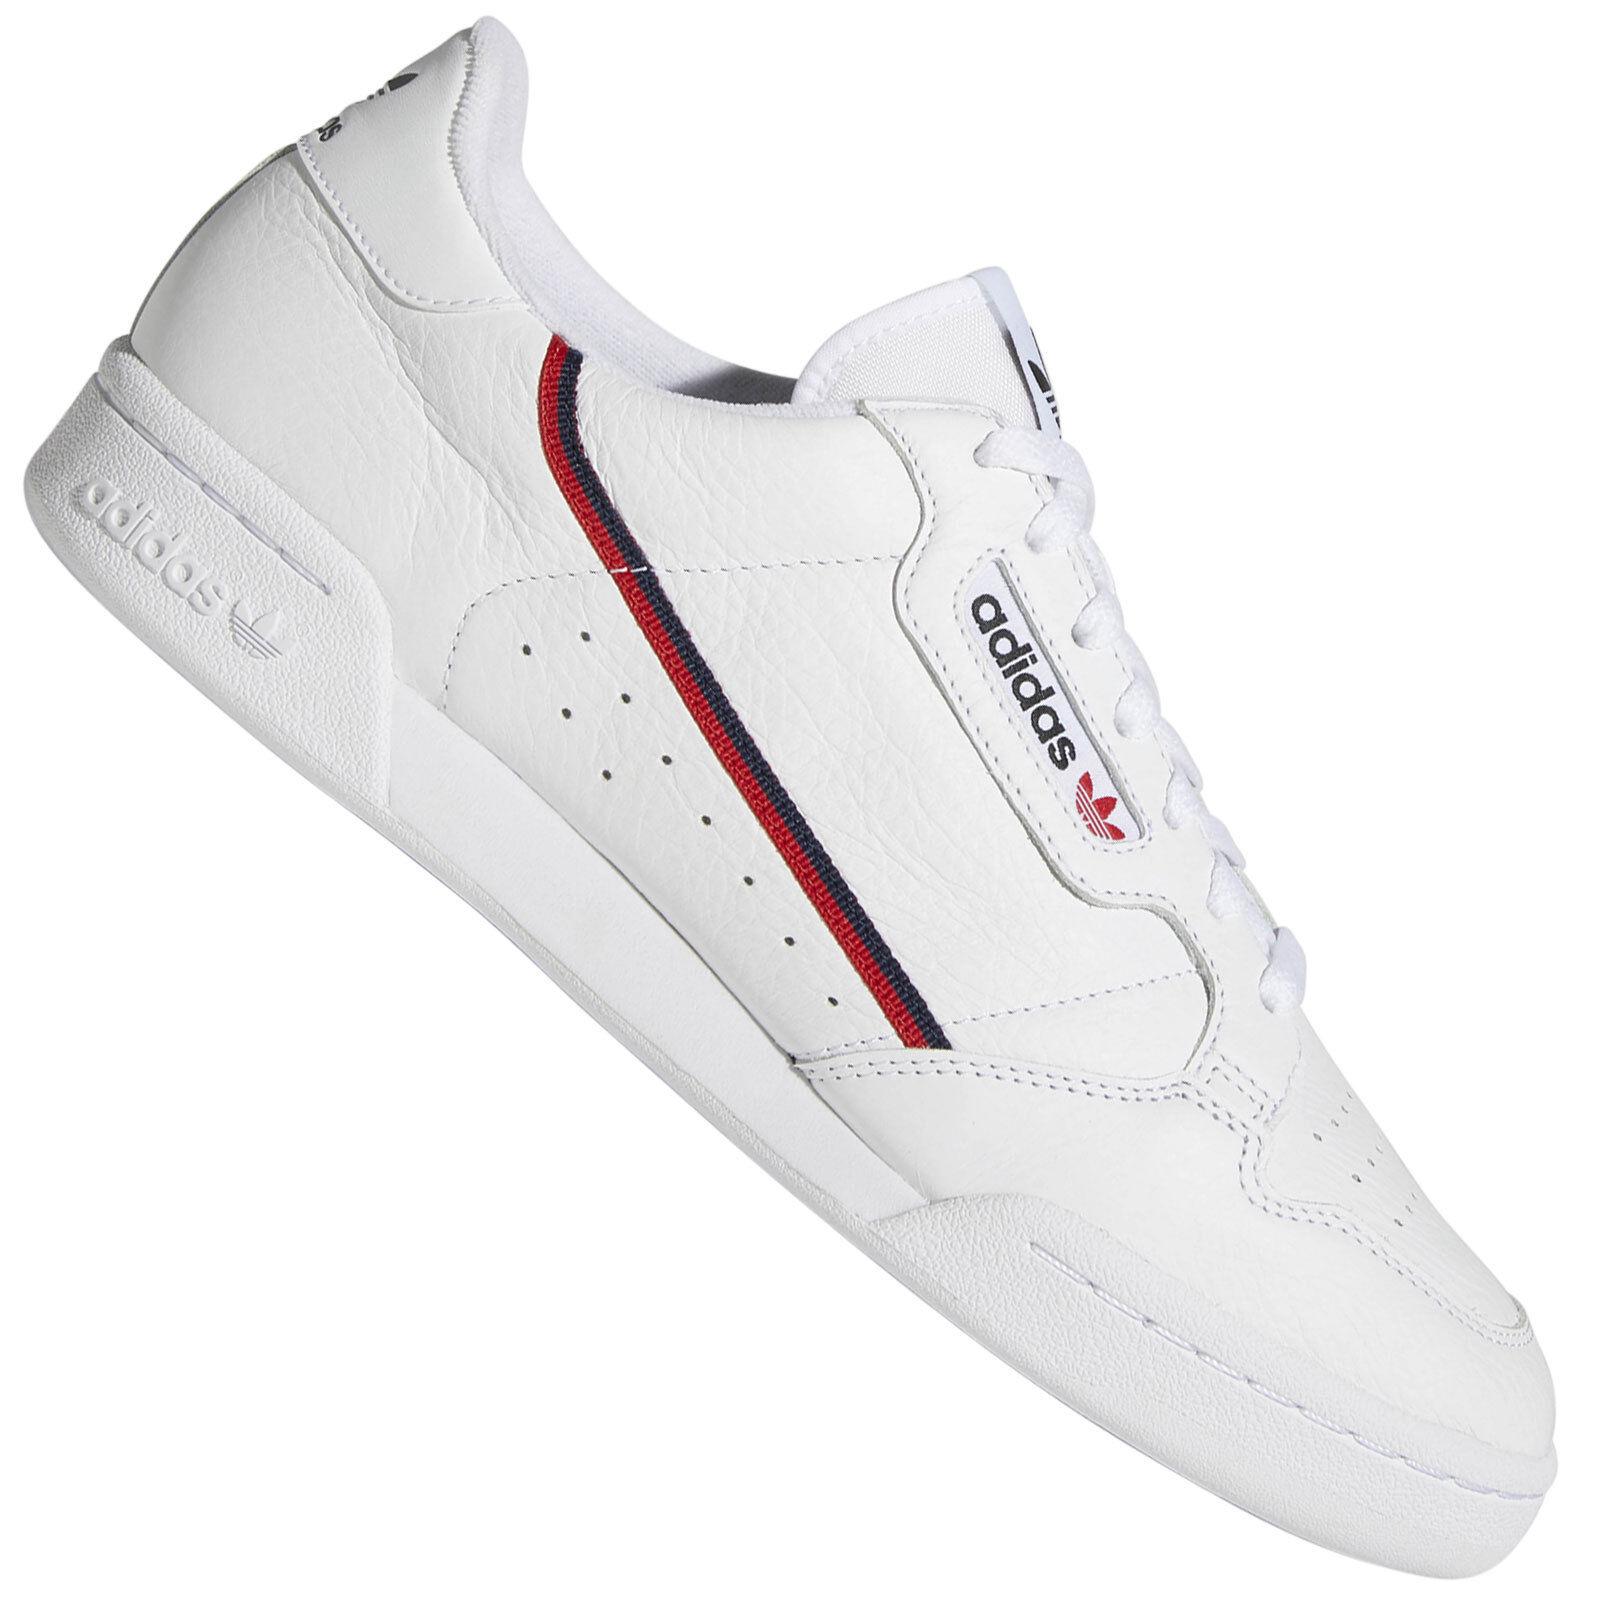 Adidas Originals Continental 80 Damen Sneaker Turnschuhe Turnschuhe Turnschuhe schuhe Freizeit Retro ba1249